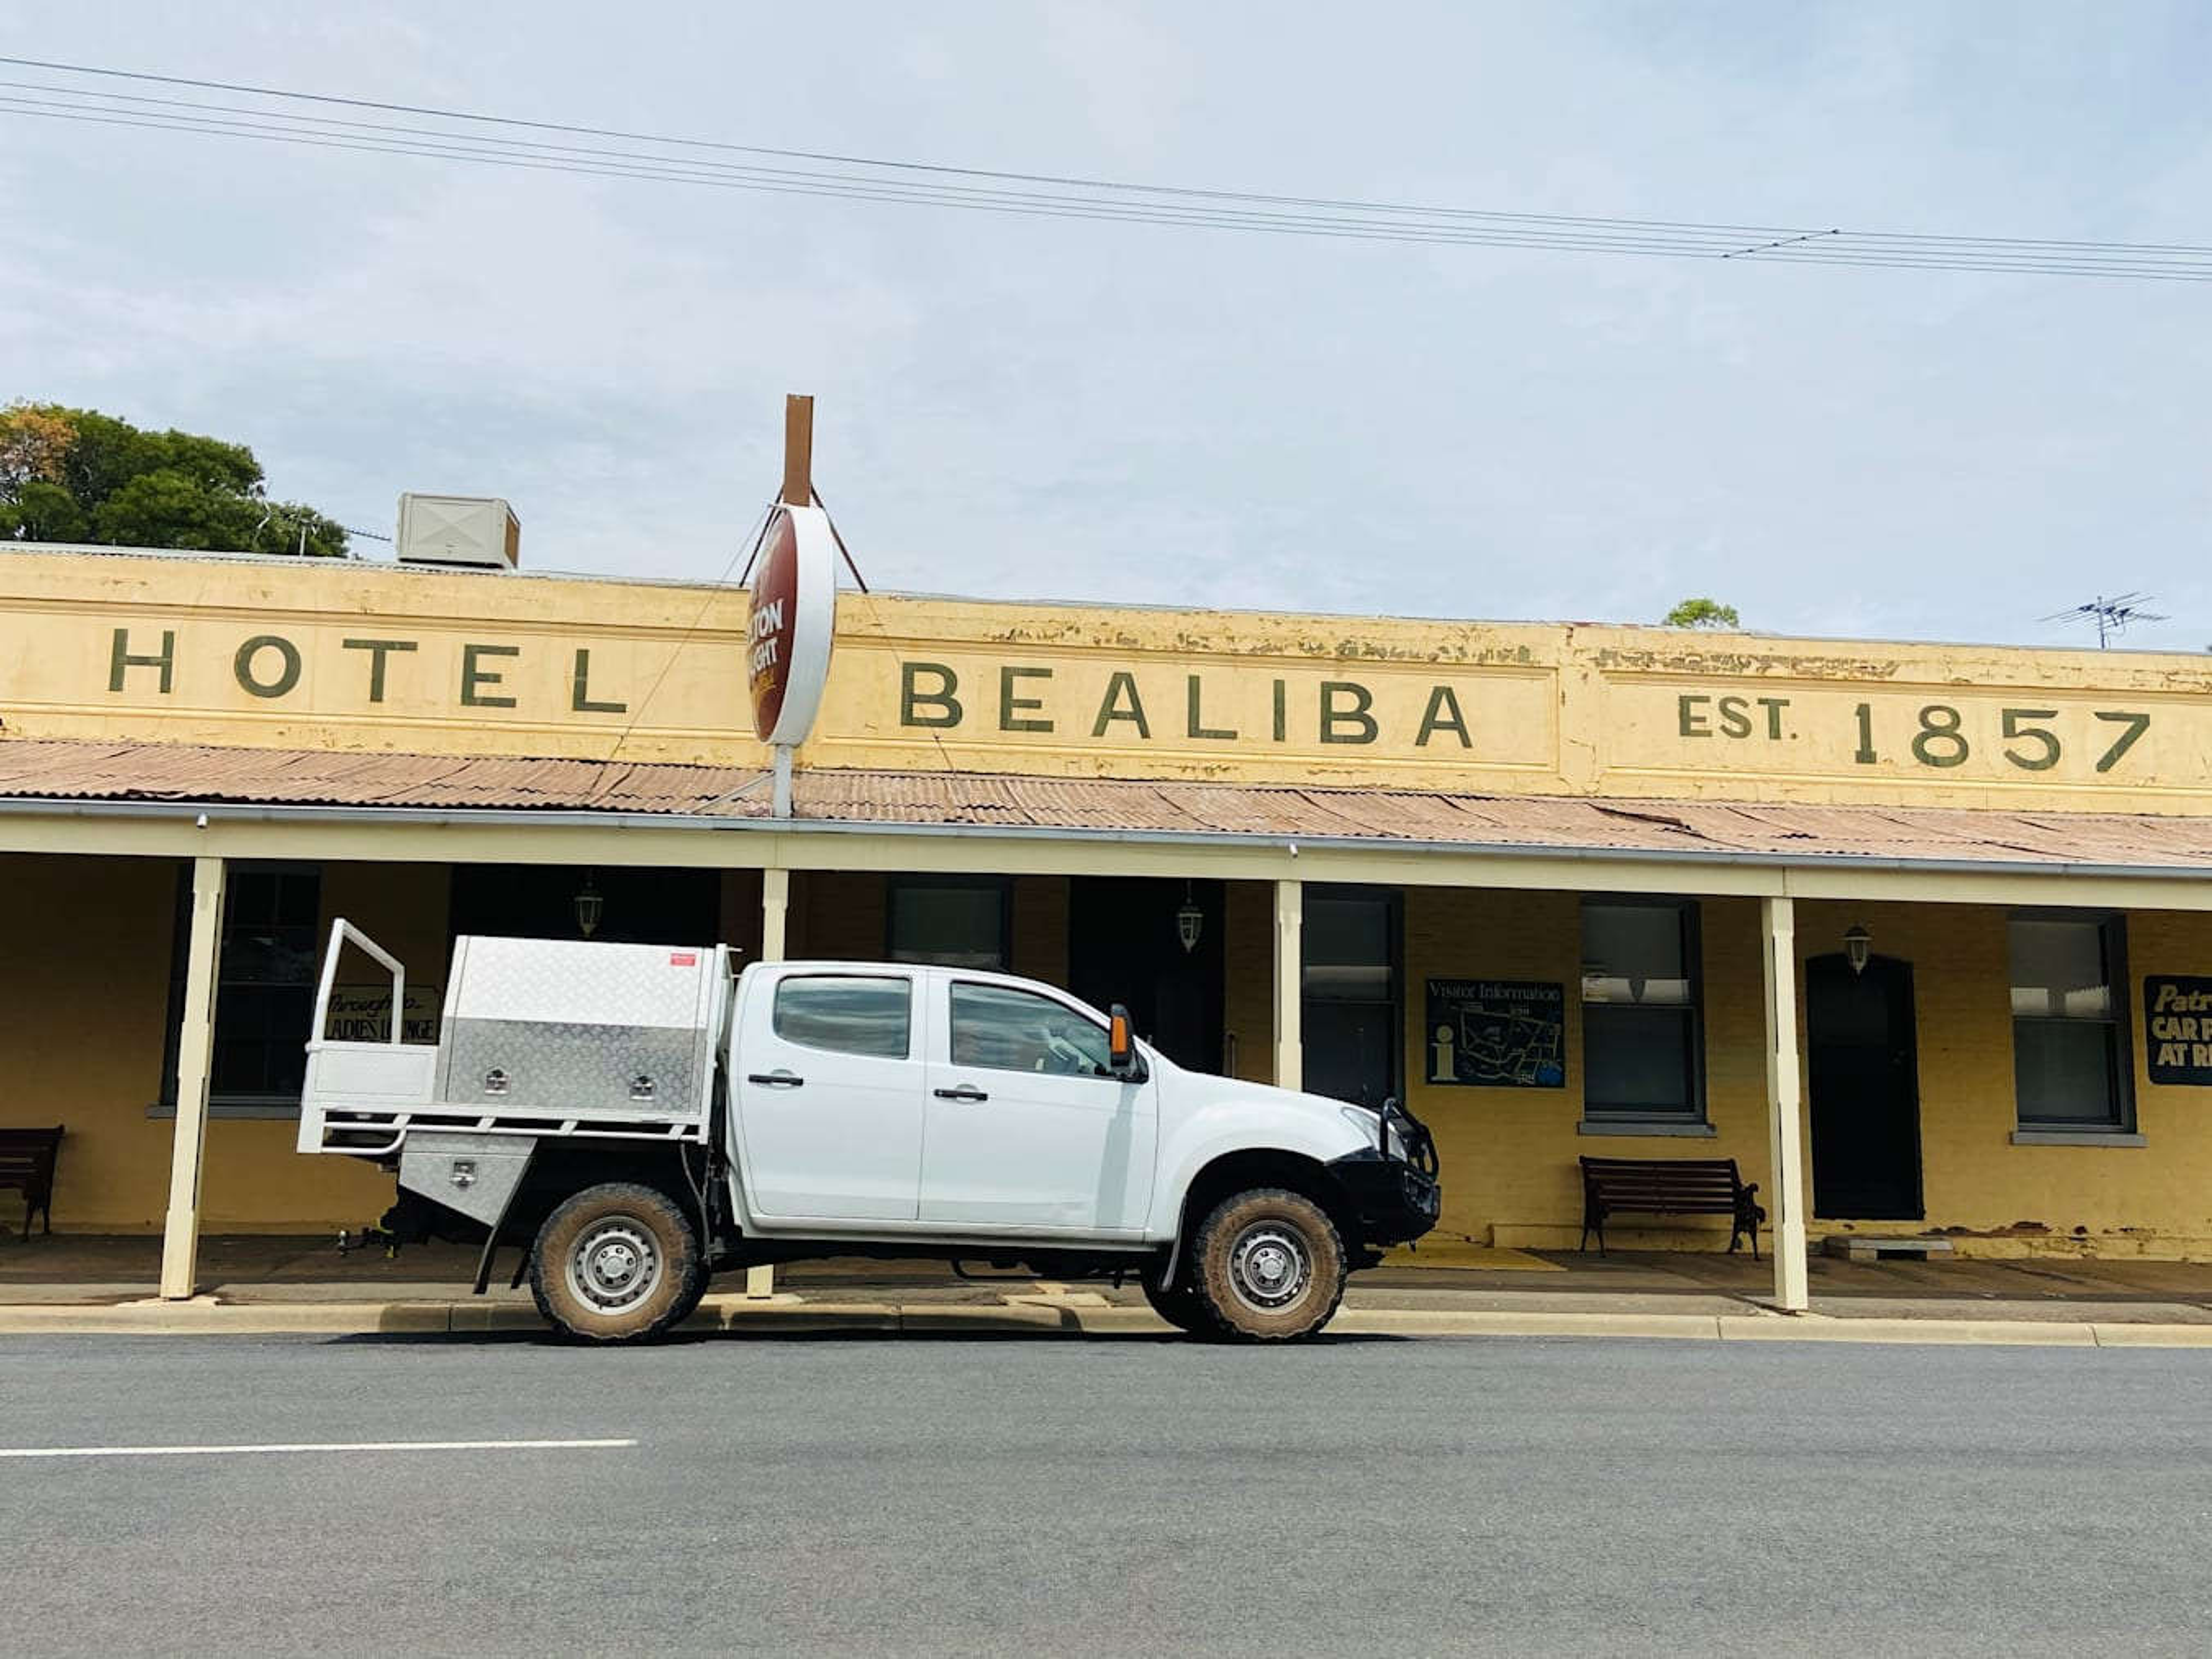 4 X 4 Australia Explore Victorian Goldfields 12